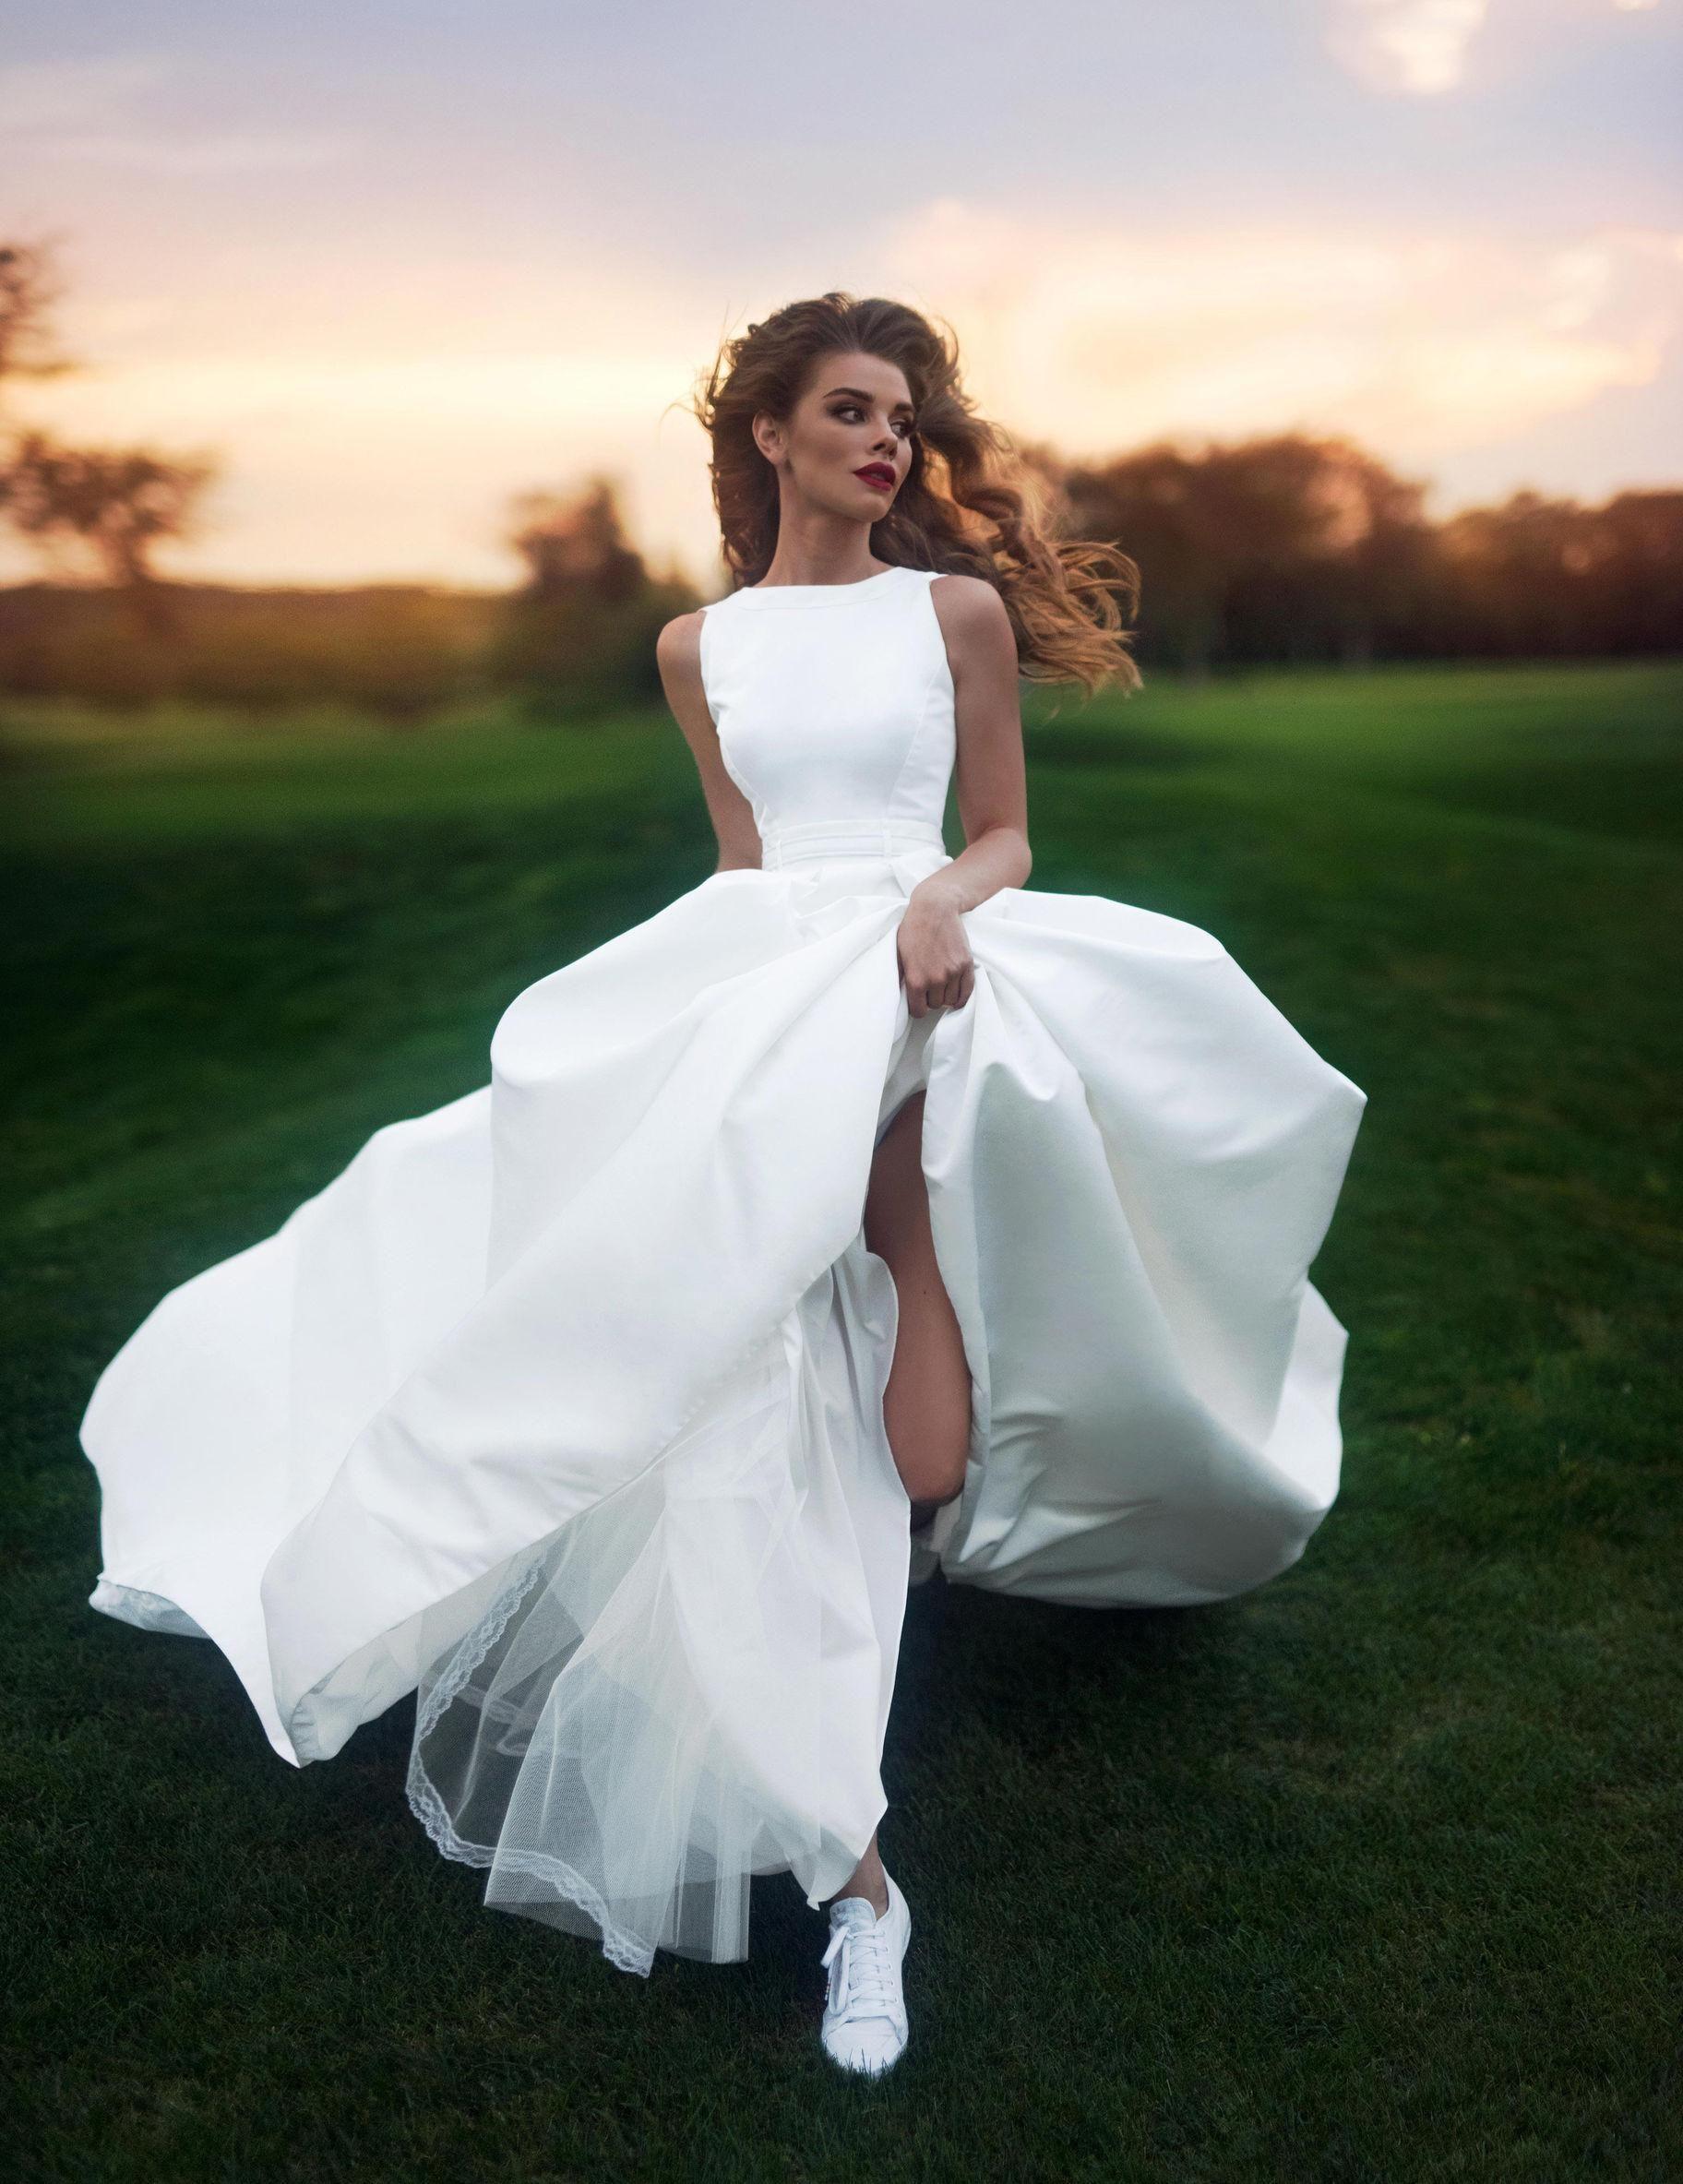 Pin by allyia castro on life pinterest wedding wedding dress